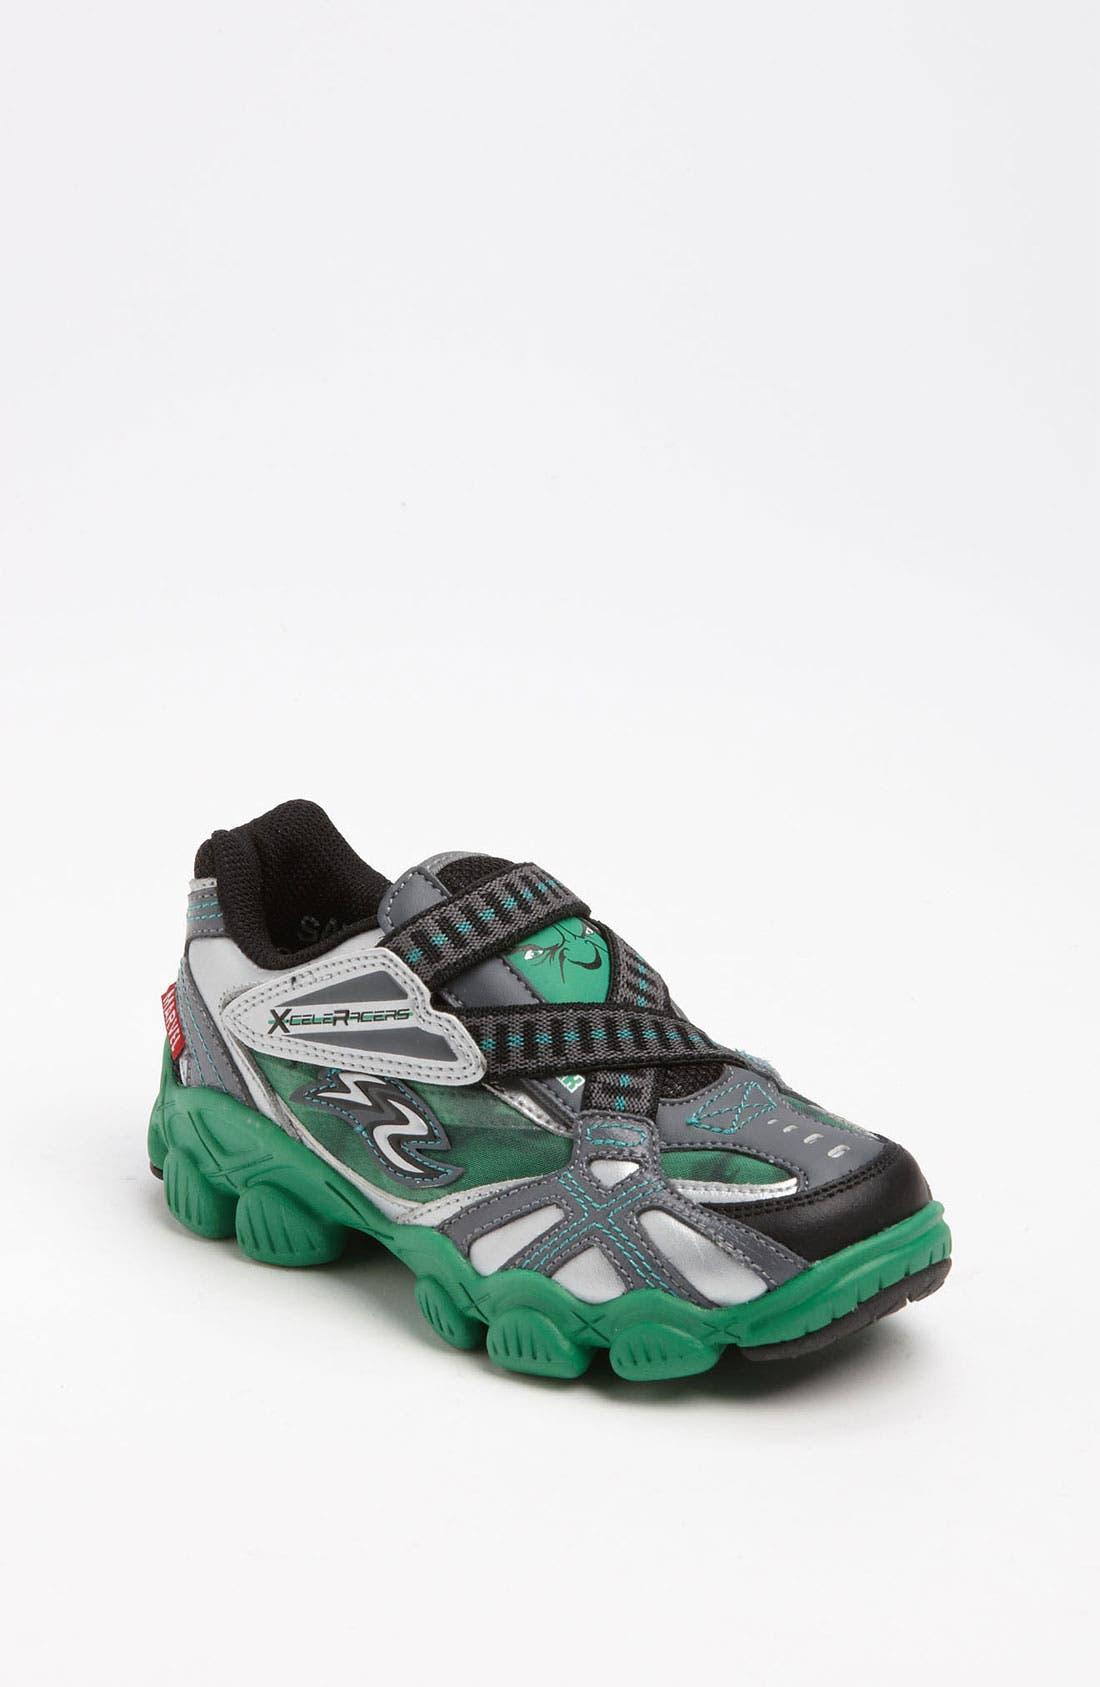 Main Image - Stride Ride 'X-Celeracers Hulk®' Sneaker (Toddler & Little Kid)